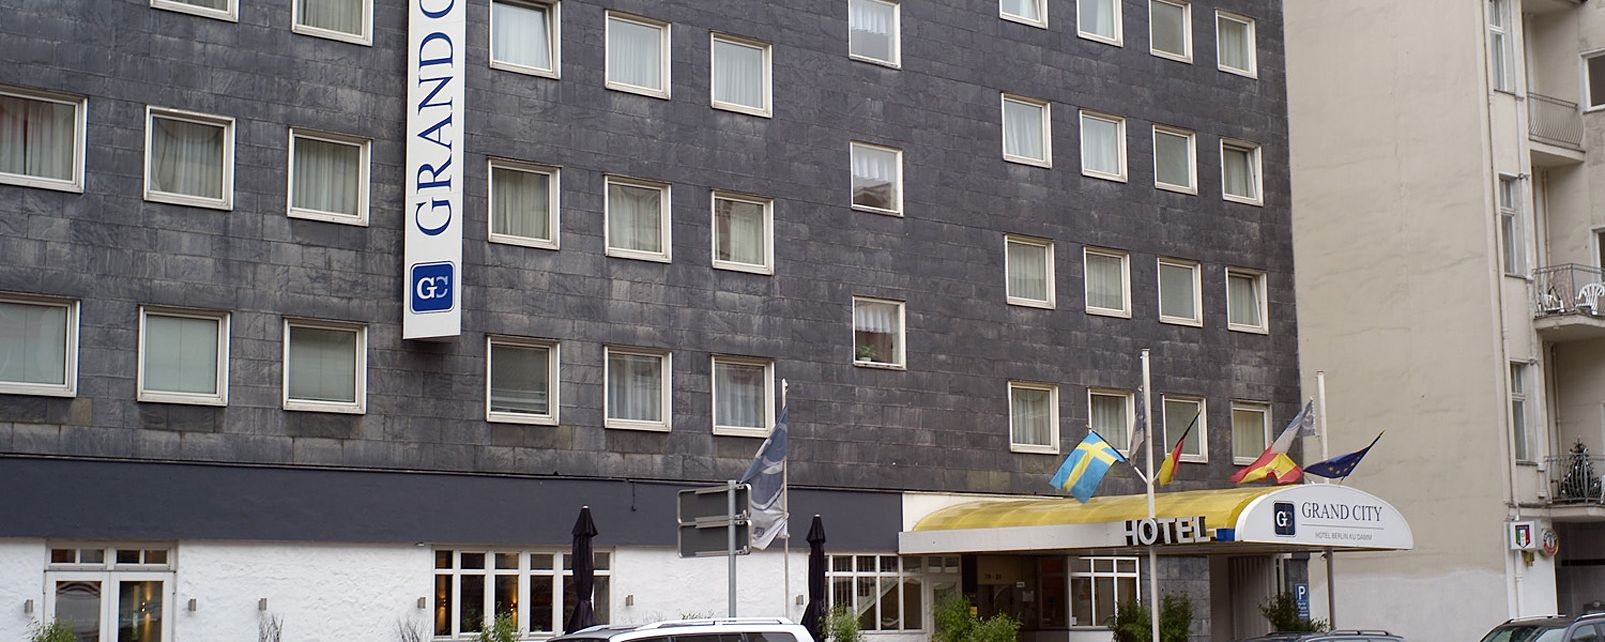 Hotel Grand City-Berlin Kudamm